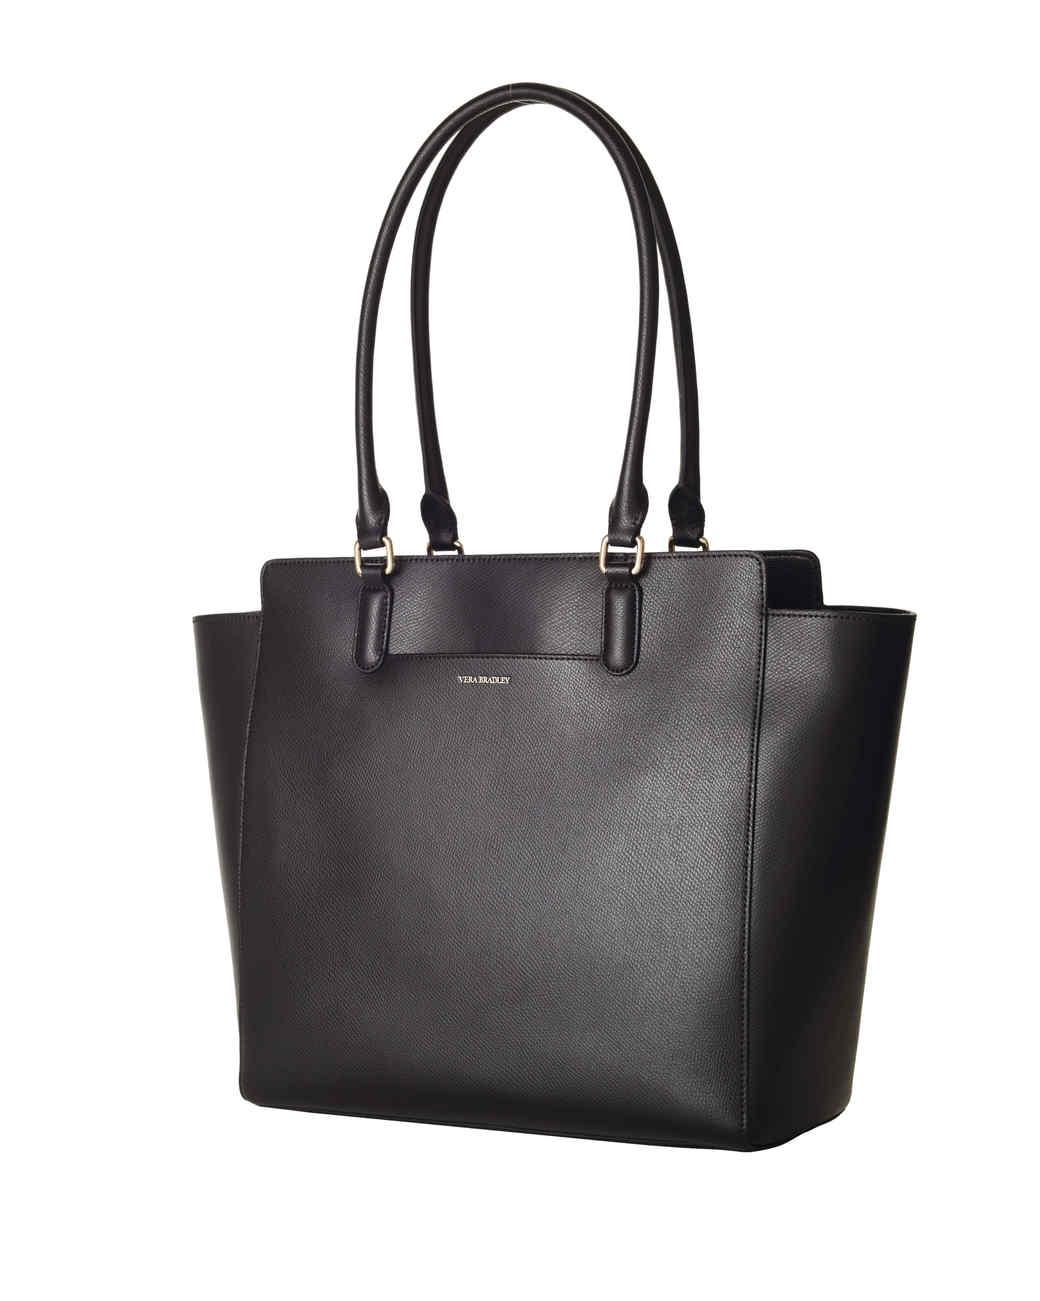 vera-bradley-bag-black-293-d112494.jpg